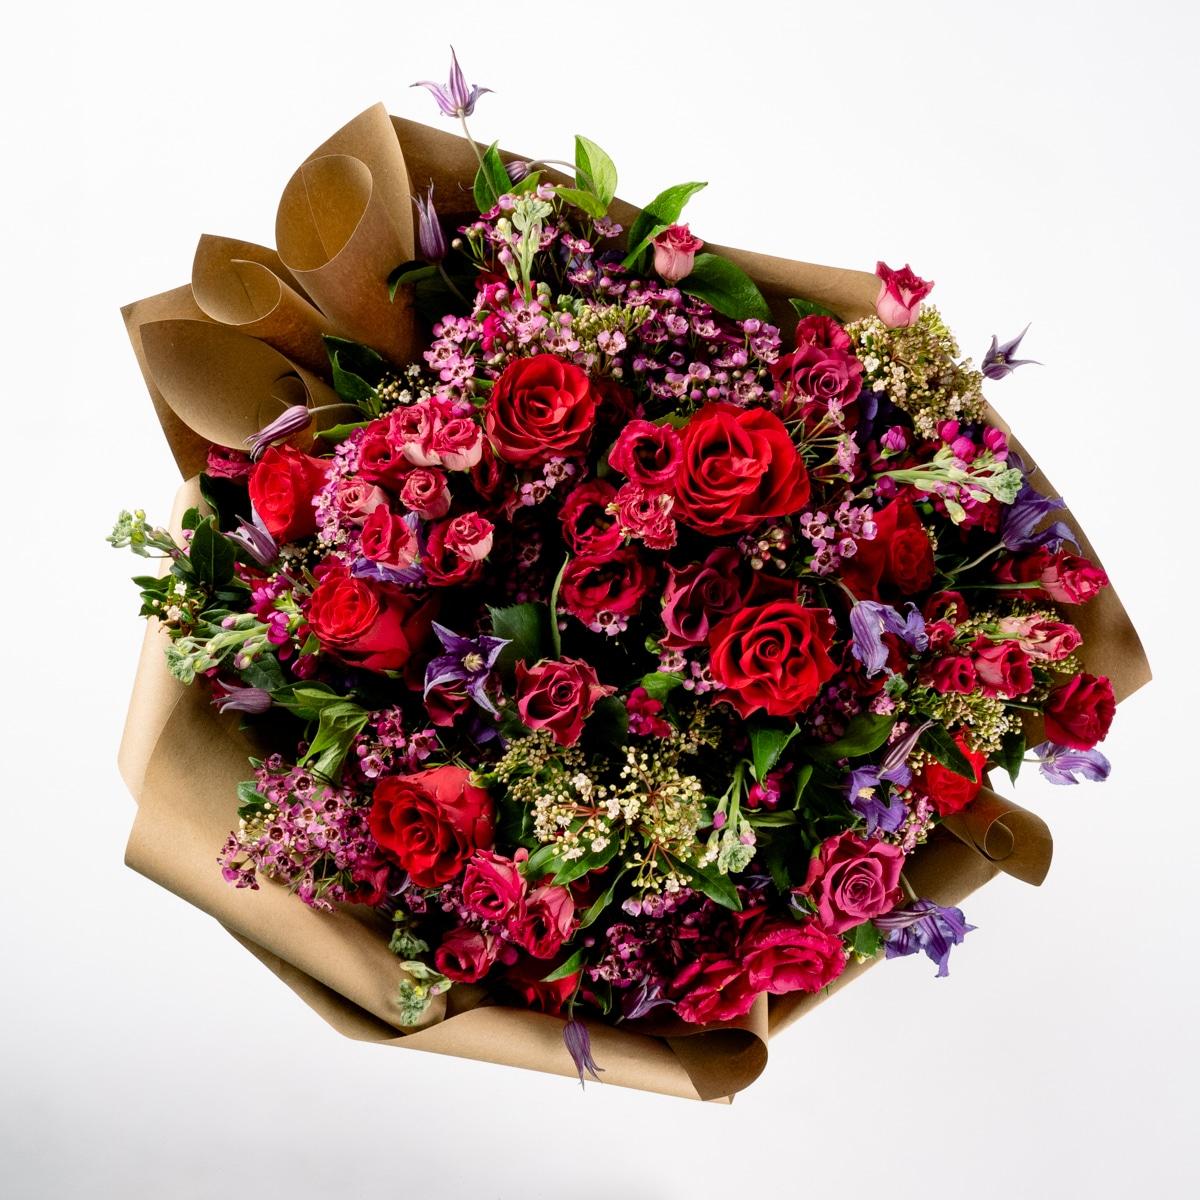 Bloom Flower Delivery | Romance Bouquet